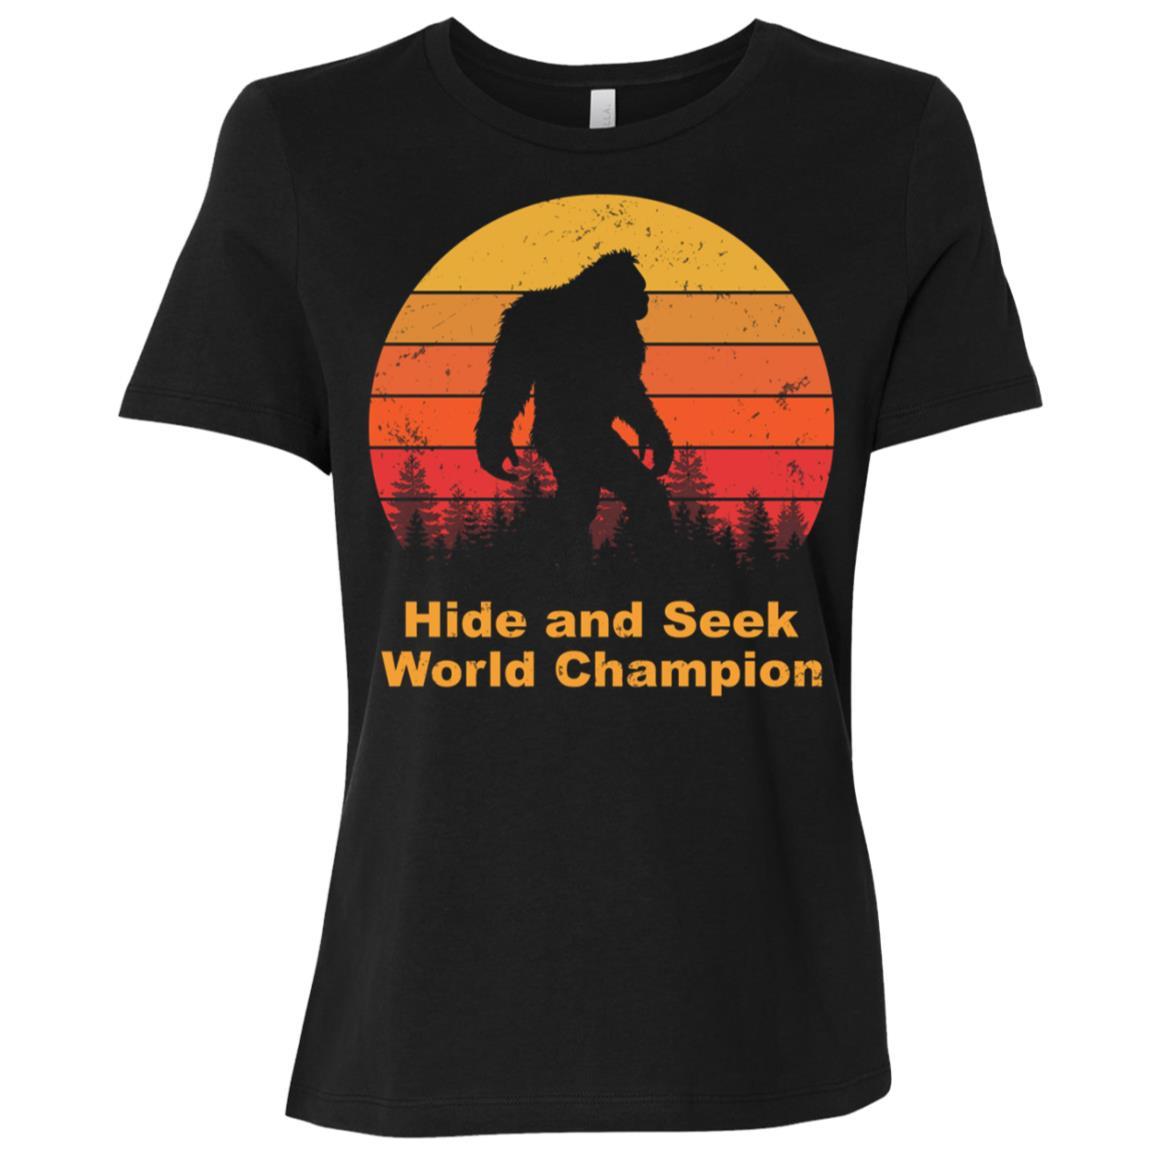 Hide and seek champion bigfoot Funny Tee-1 Women Short Sleeve T-Shirt